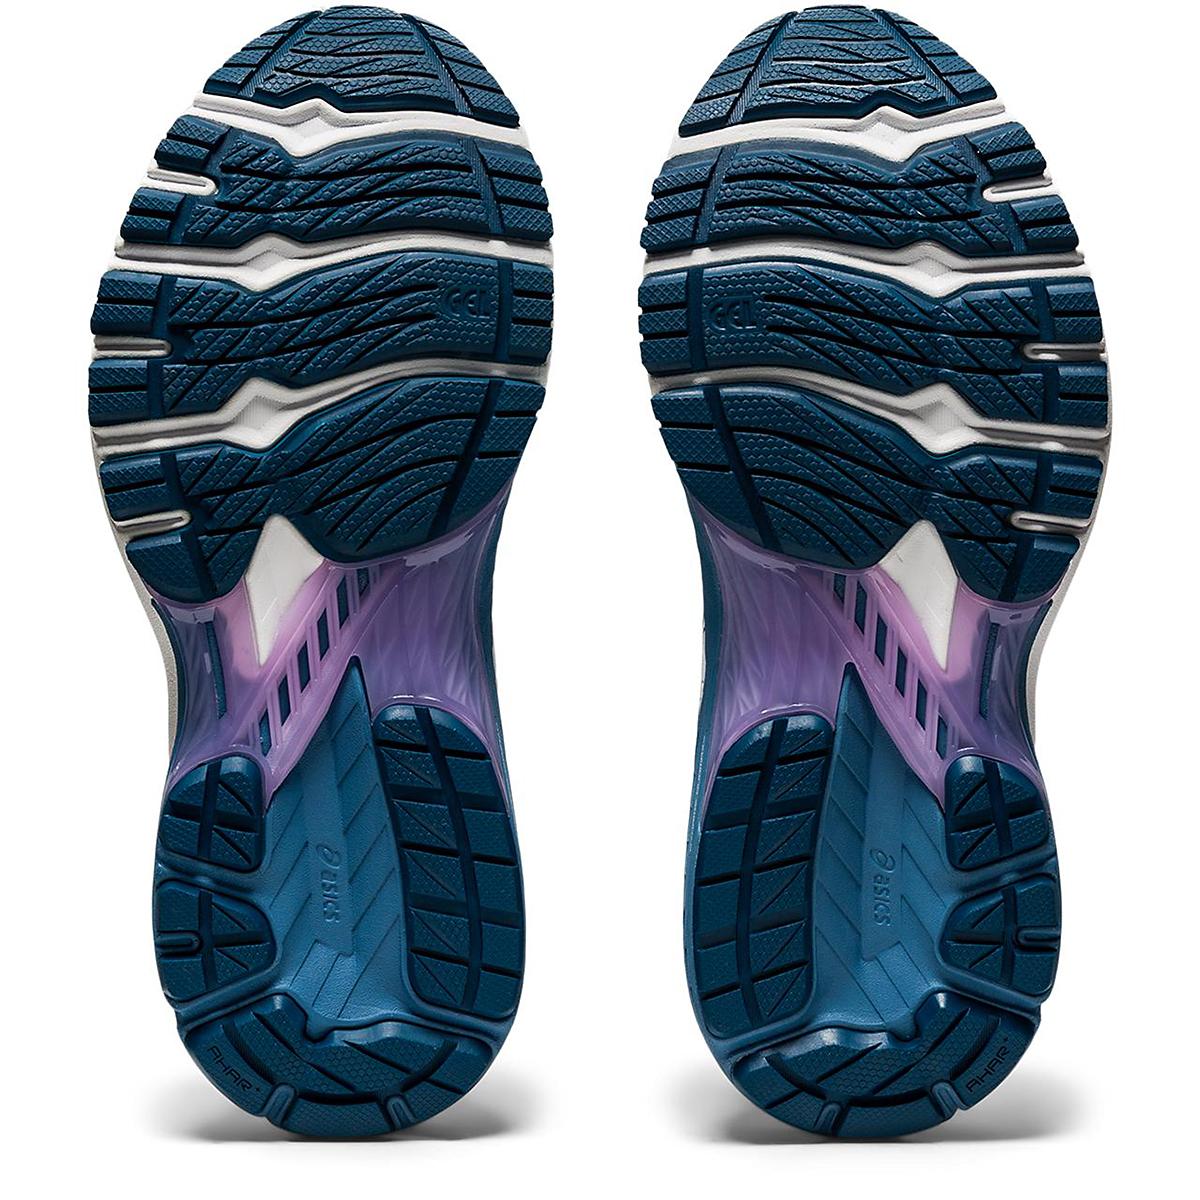 Women's Asics Gt-2000 9 Running Shoe - Color: Mako Blue/Grey Floss - Size: 5 - Width: Regular, Mako Blue/Grey Floss, large, image 4